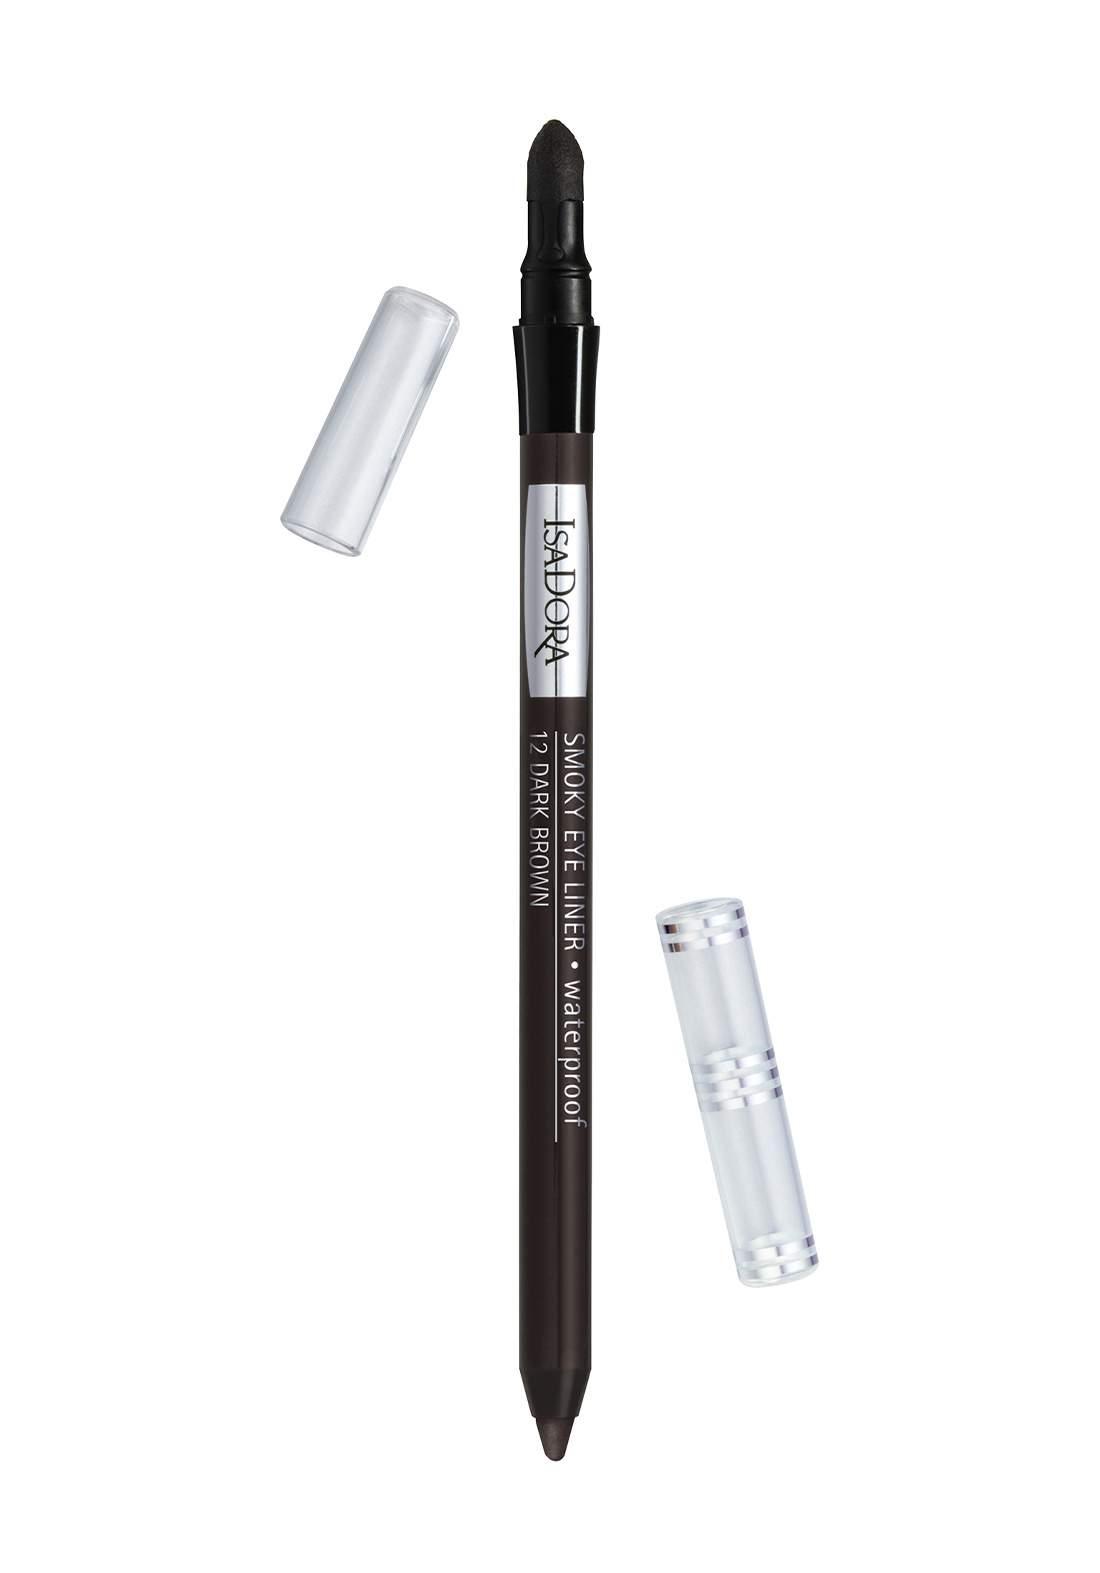 314225 Isadora Smoky Eye Liner No.12 Dark Brown محدد العيون